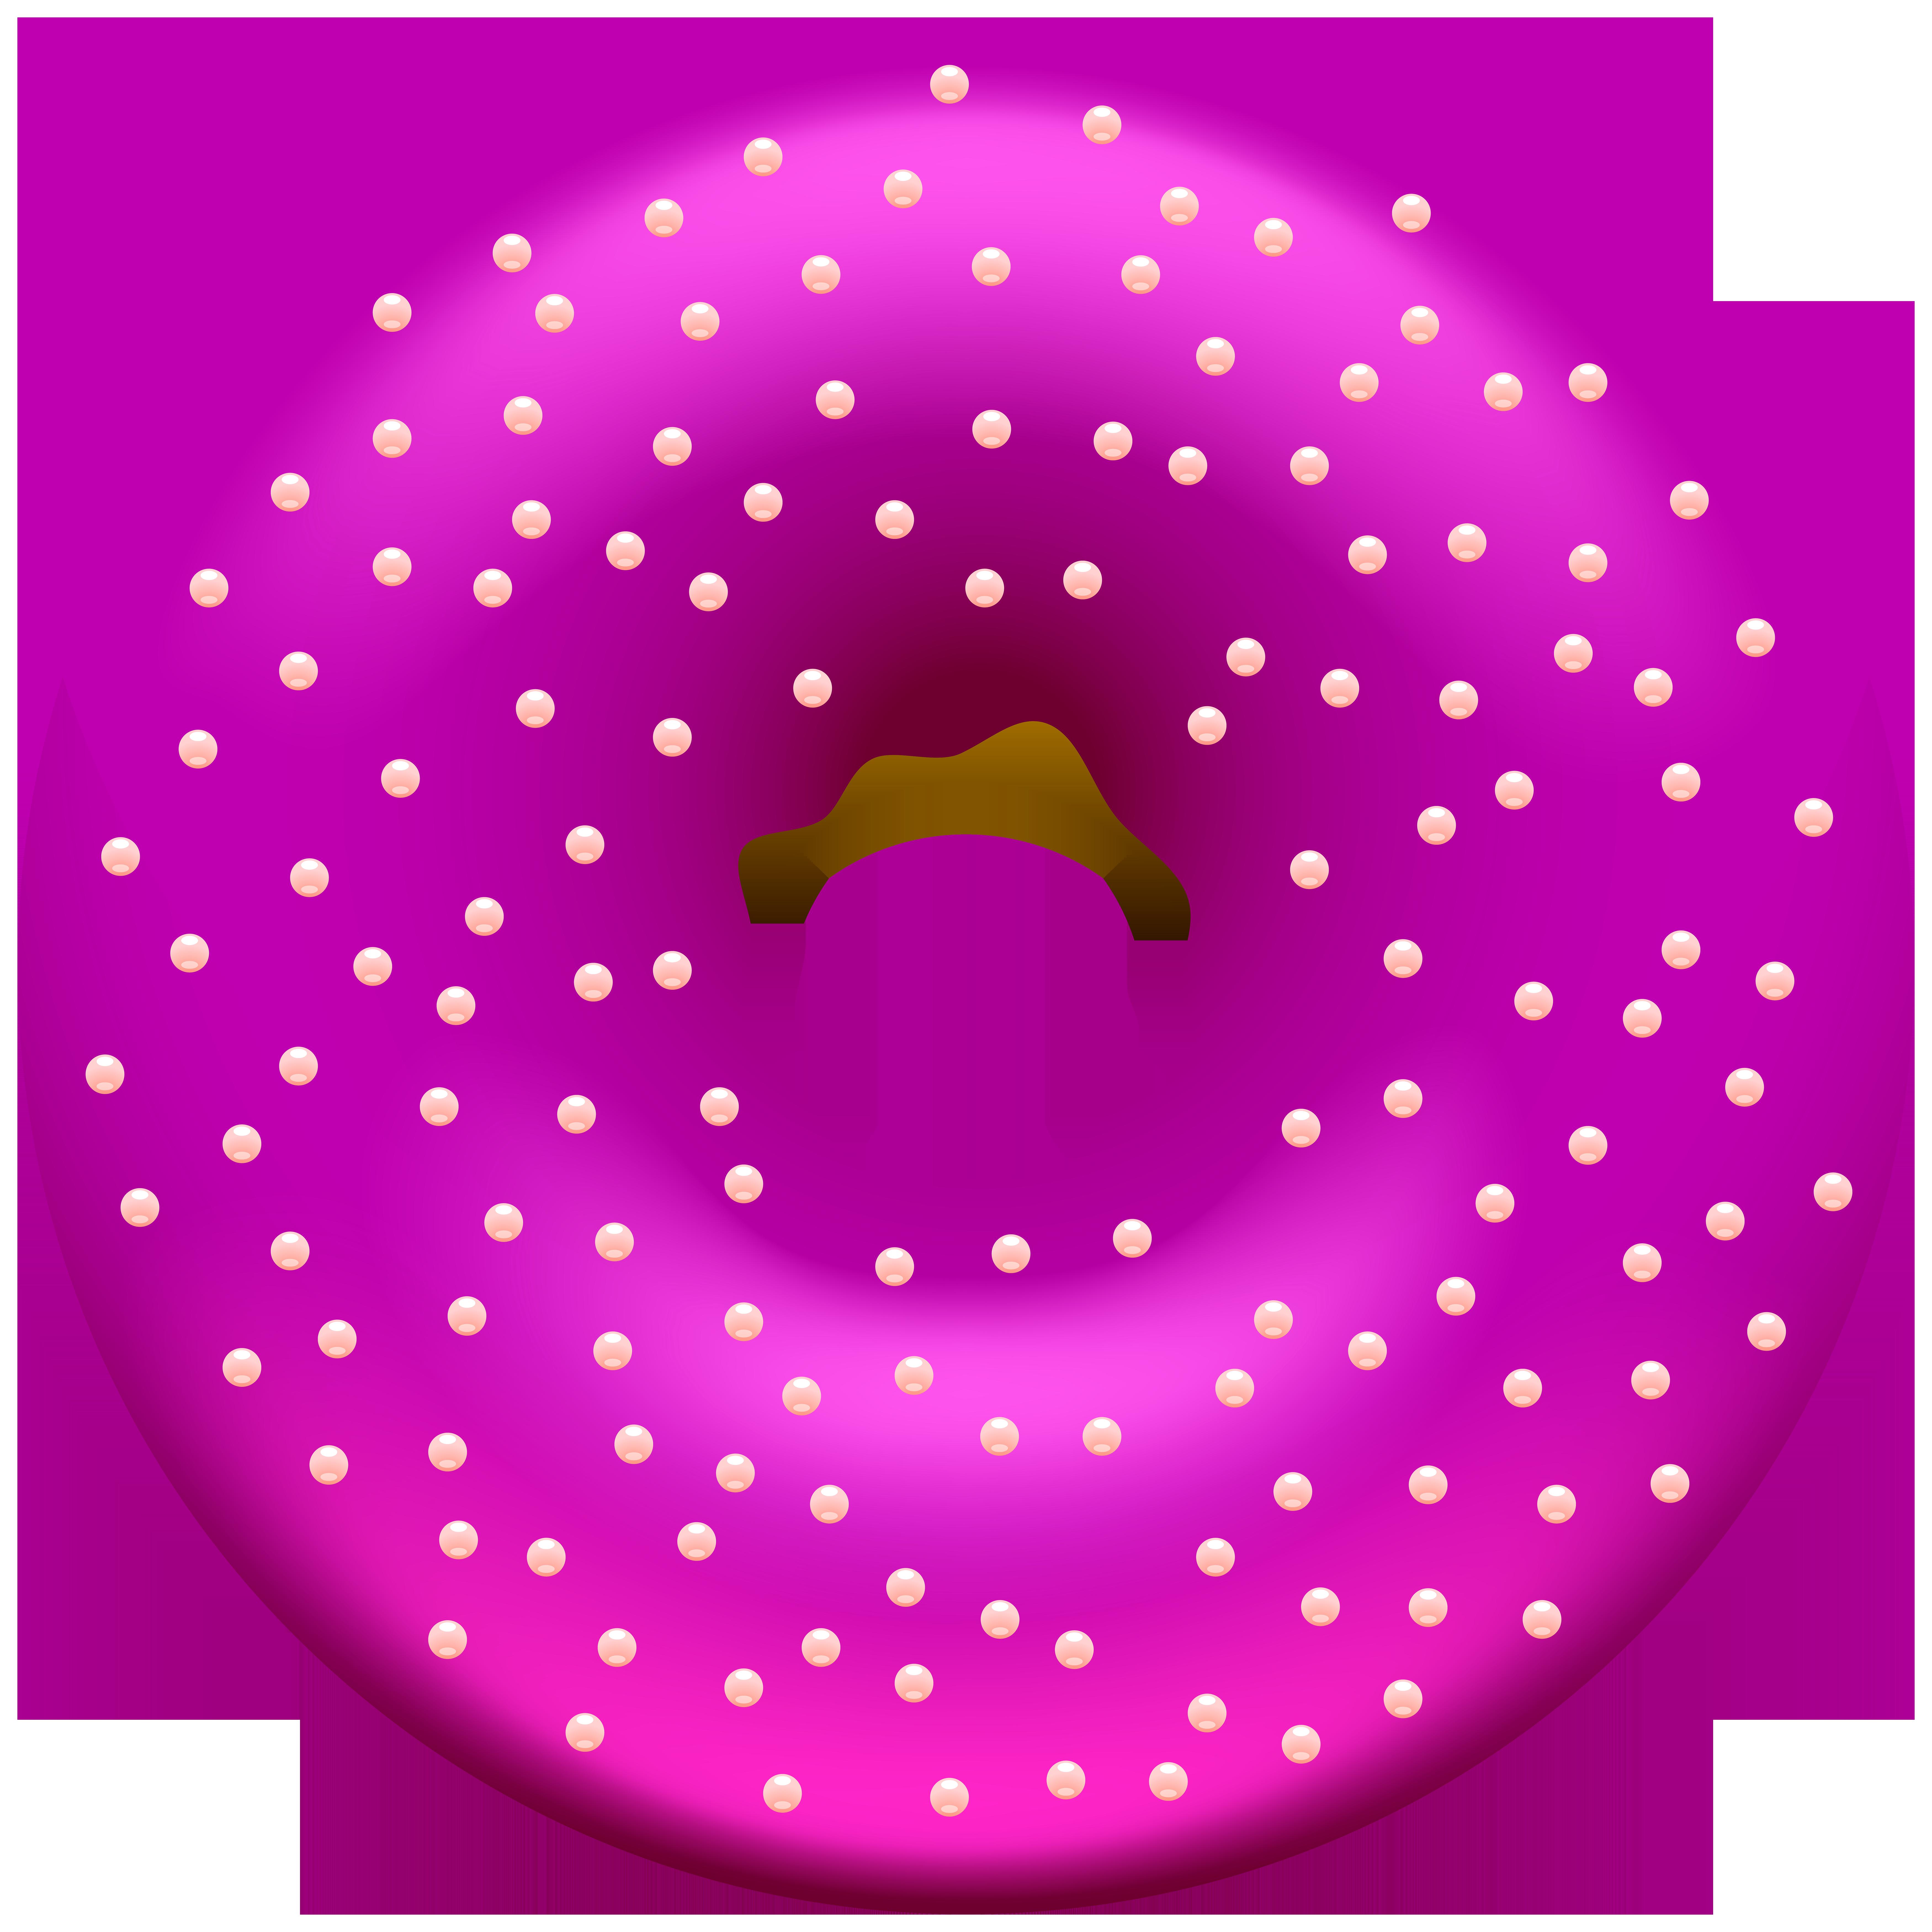 Png transparent clip art. Donut clipart clear background